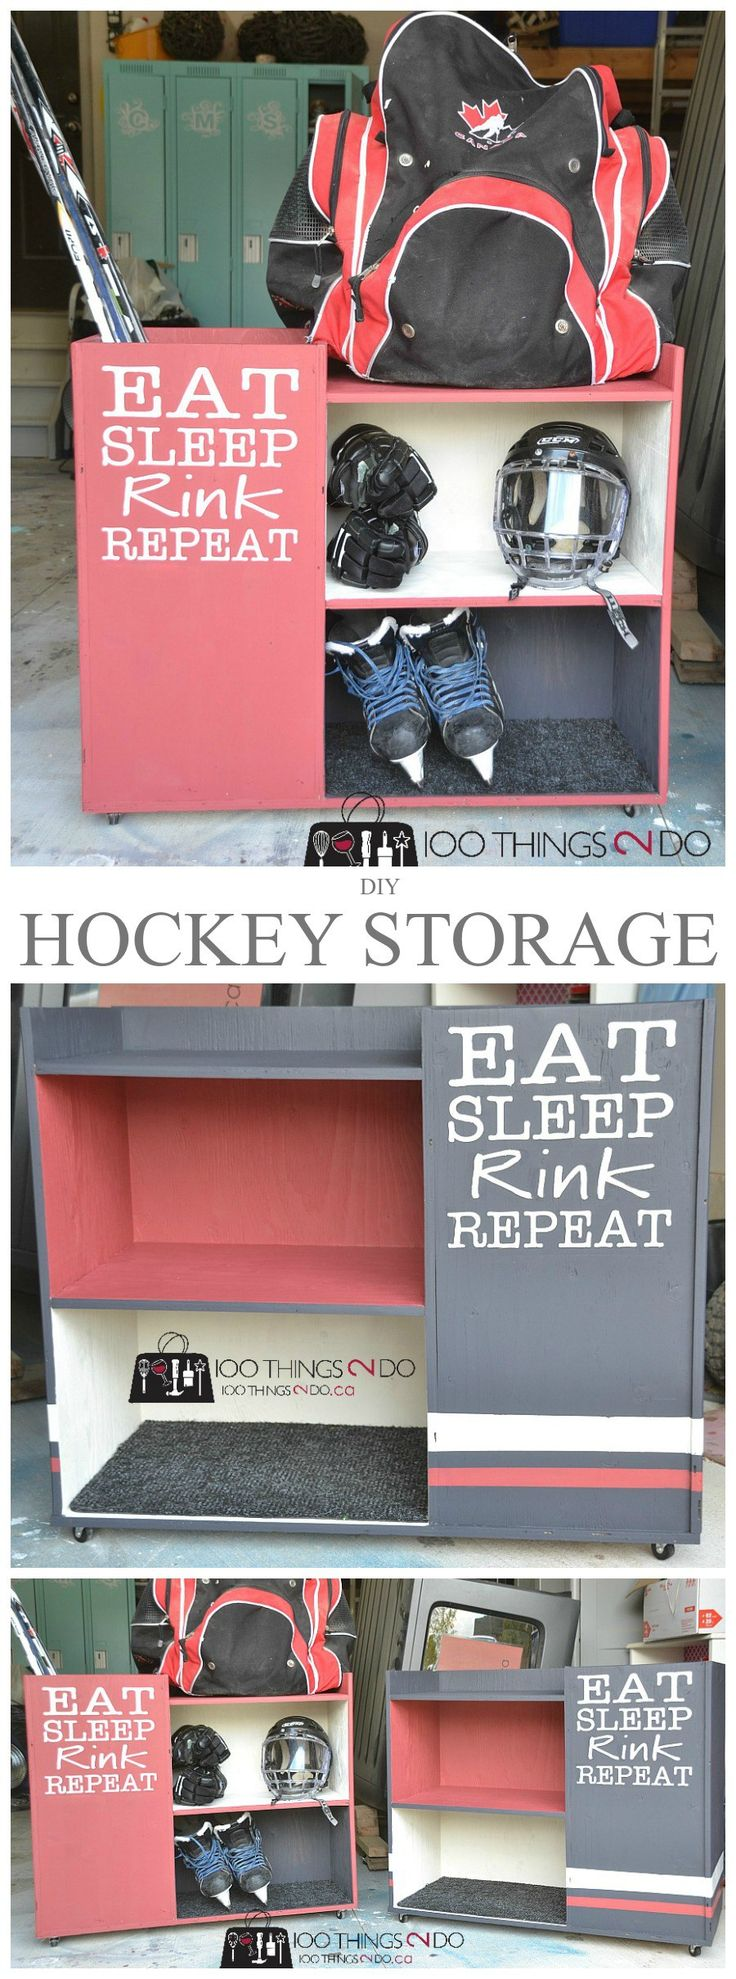 Hockey storage, sports storage, DIY hockey storage rack, DIY sports rack